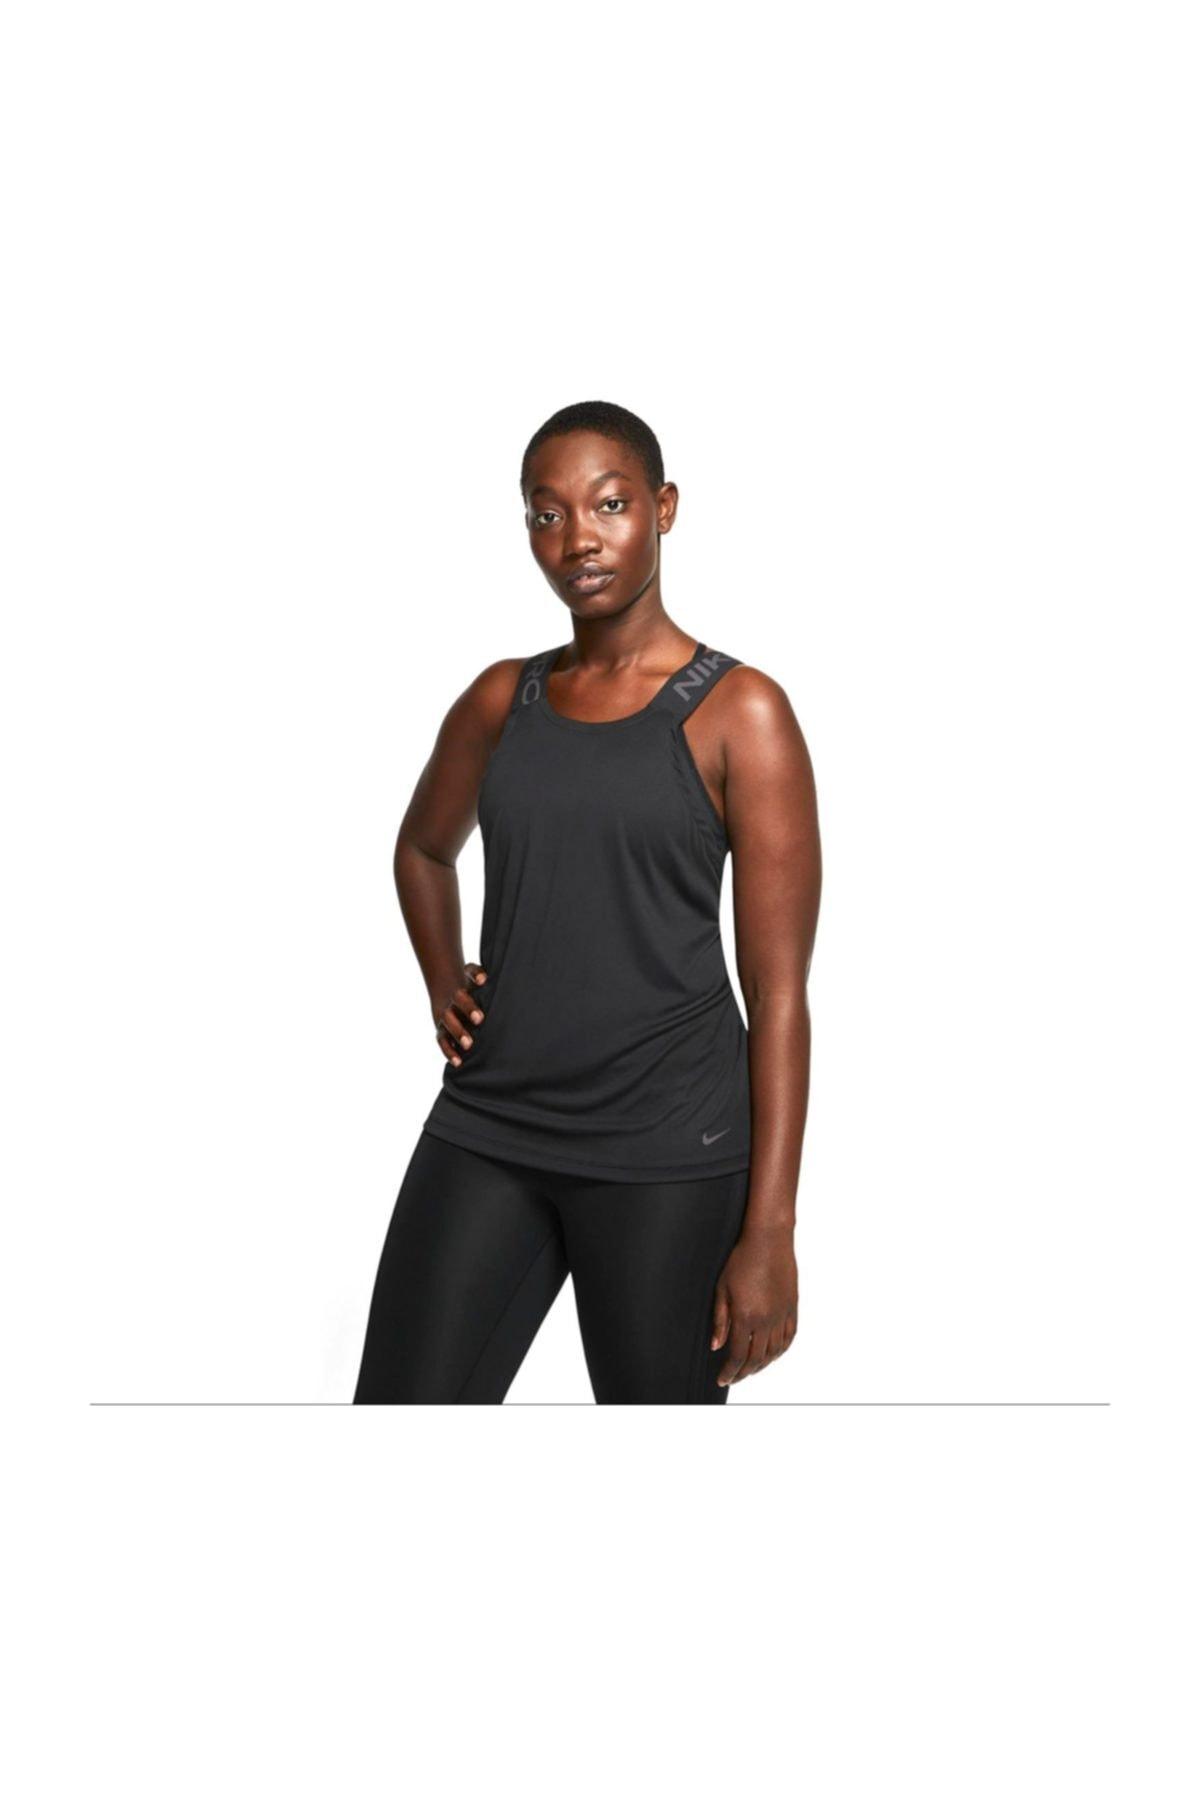 خرید رکابی ورزشی نخی مارک Nike رنگ مشکی کد ty38303507